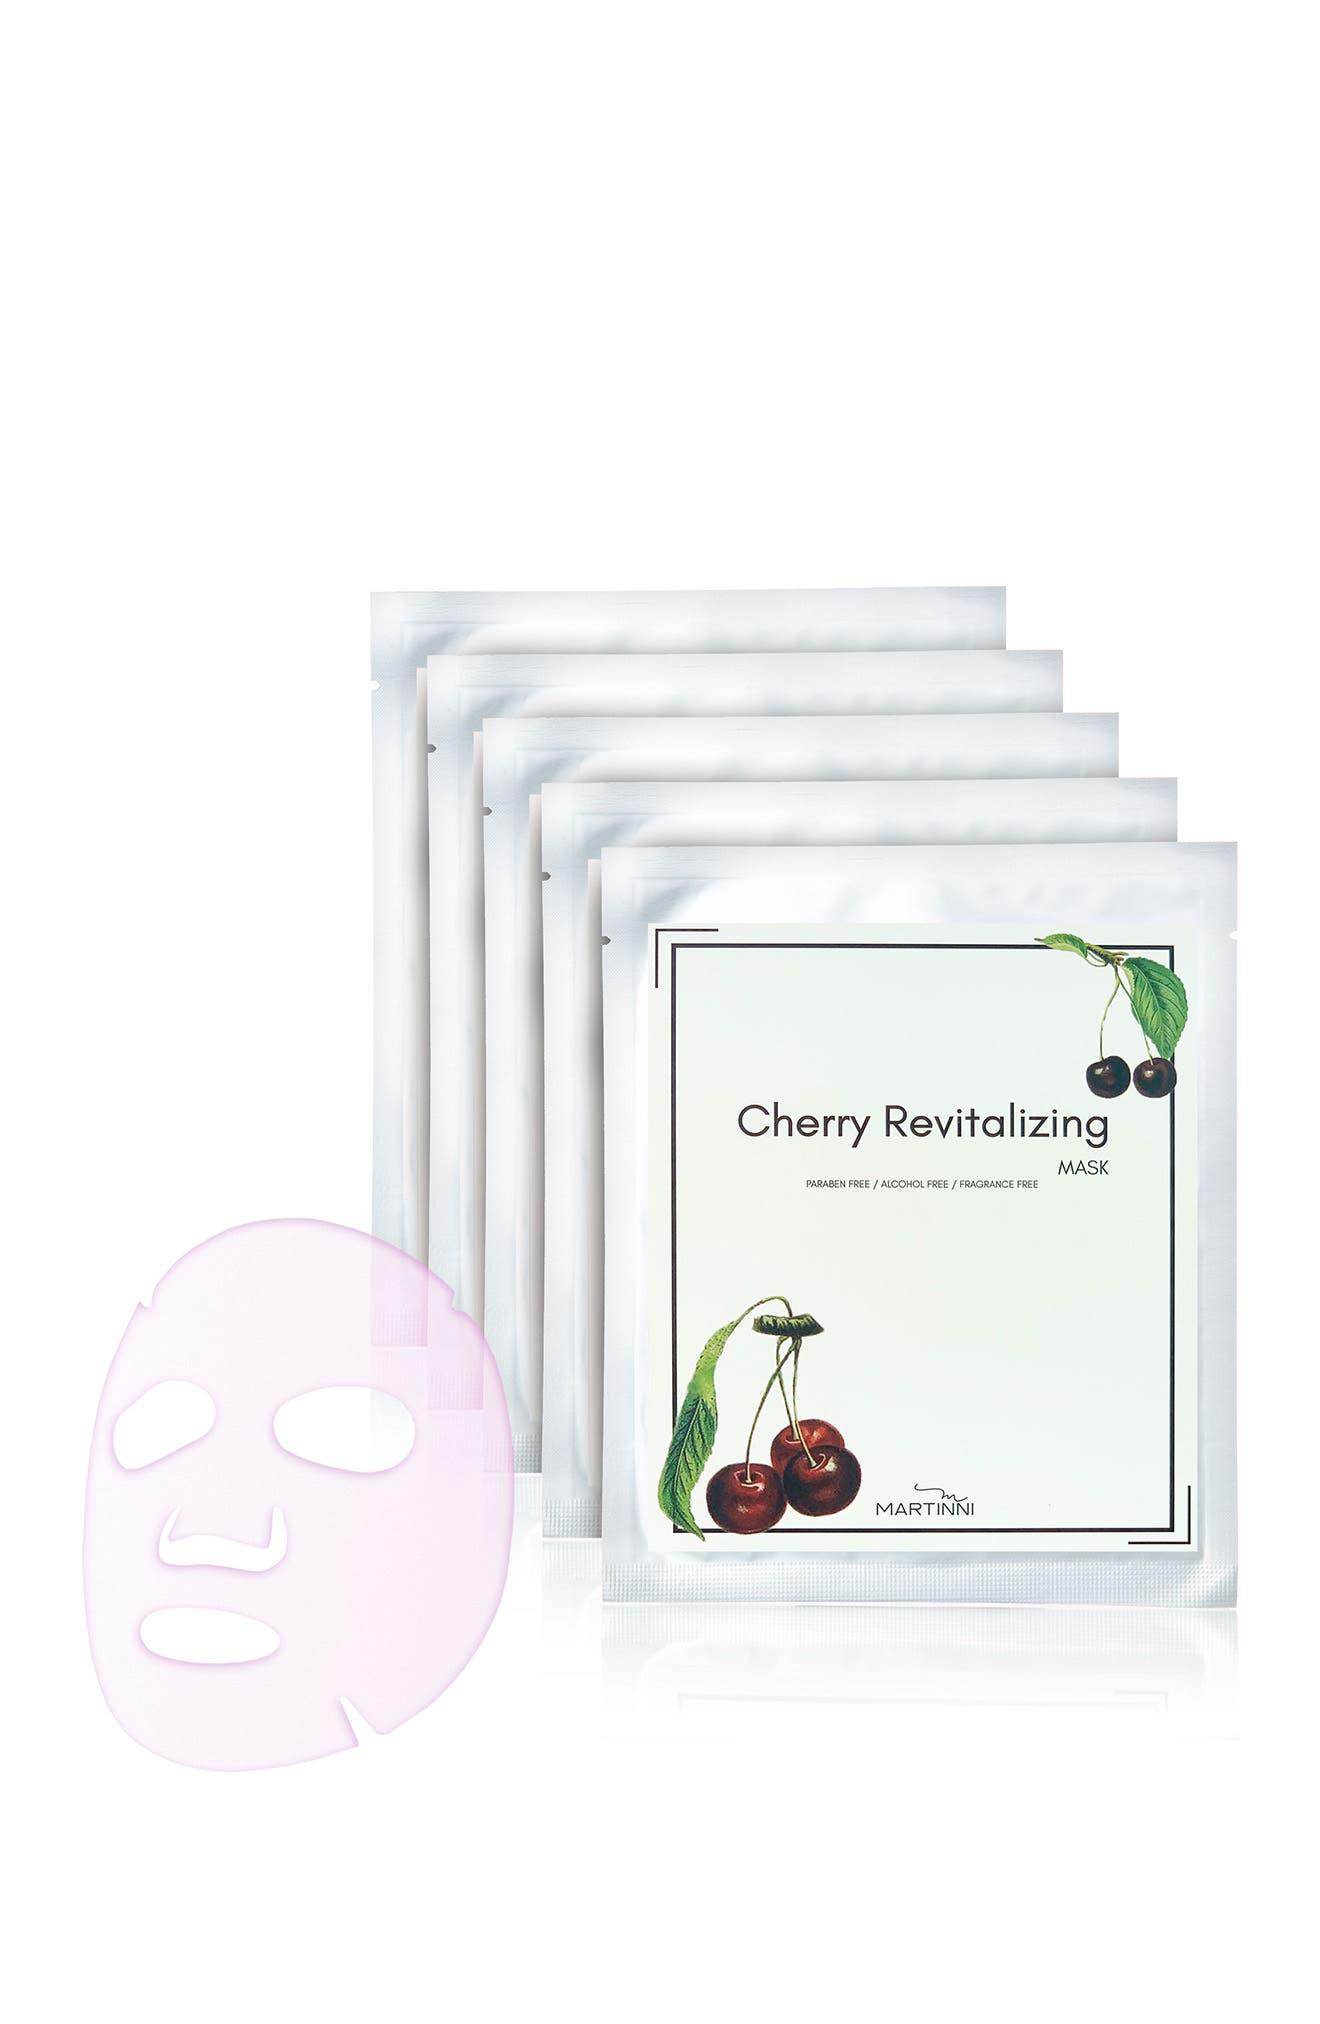 Image of MARTINNI MASKS Cherry Revitalizing Face Mask - Pack of 5